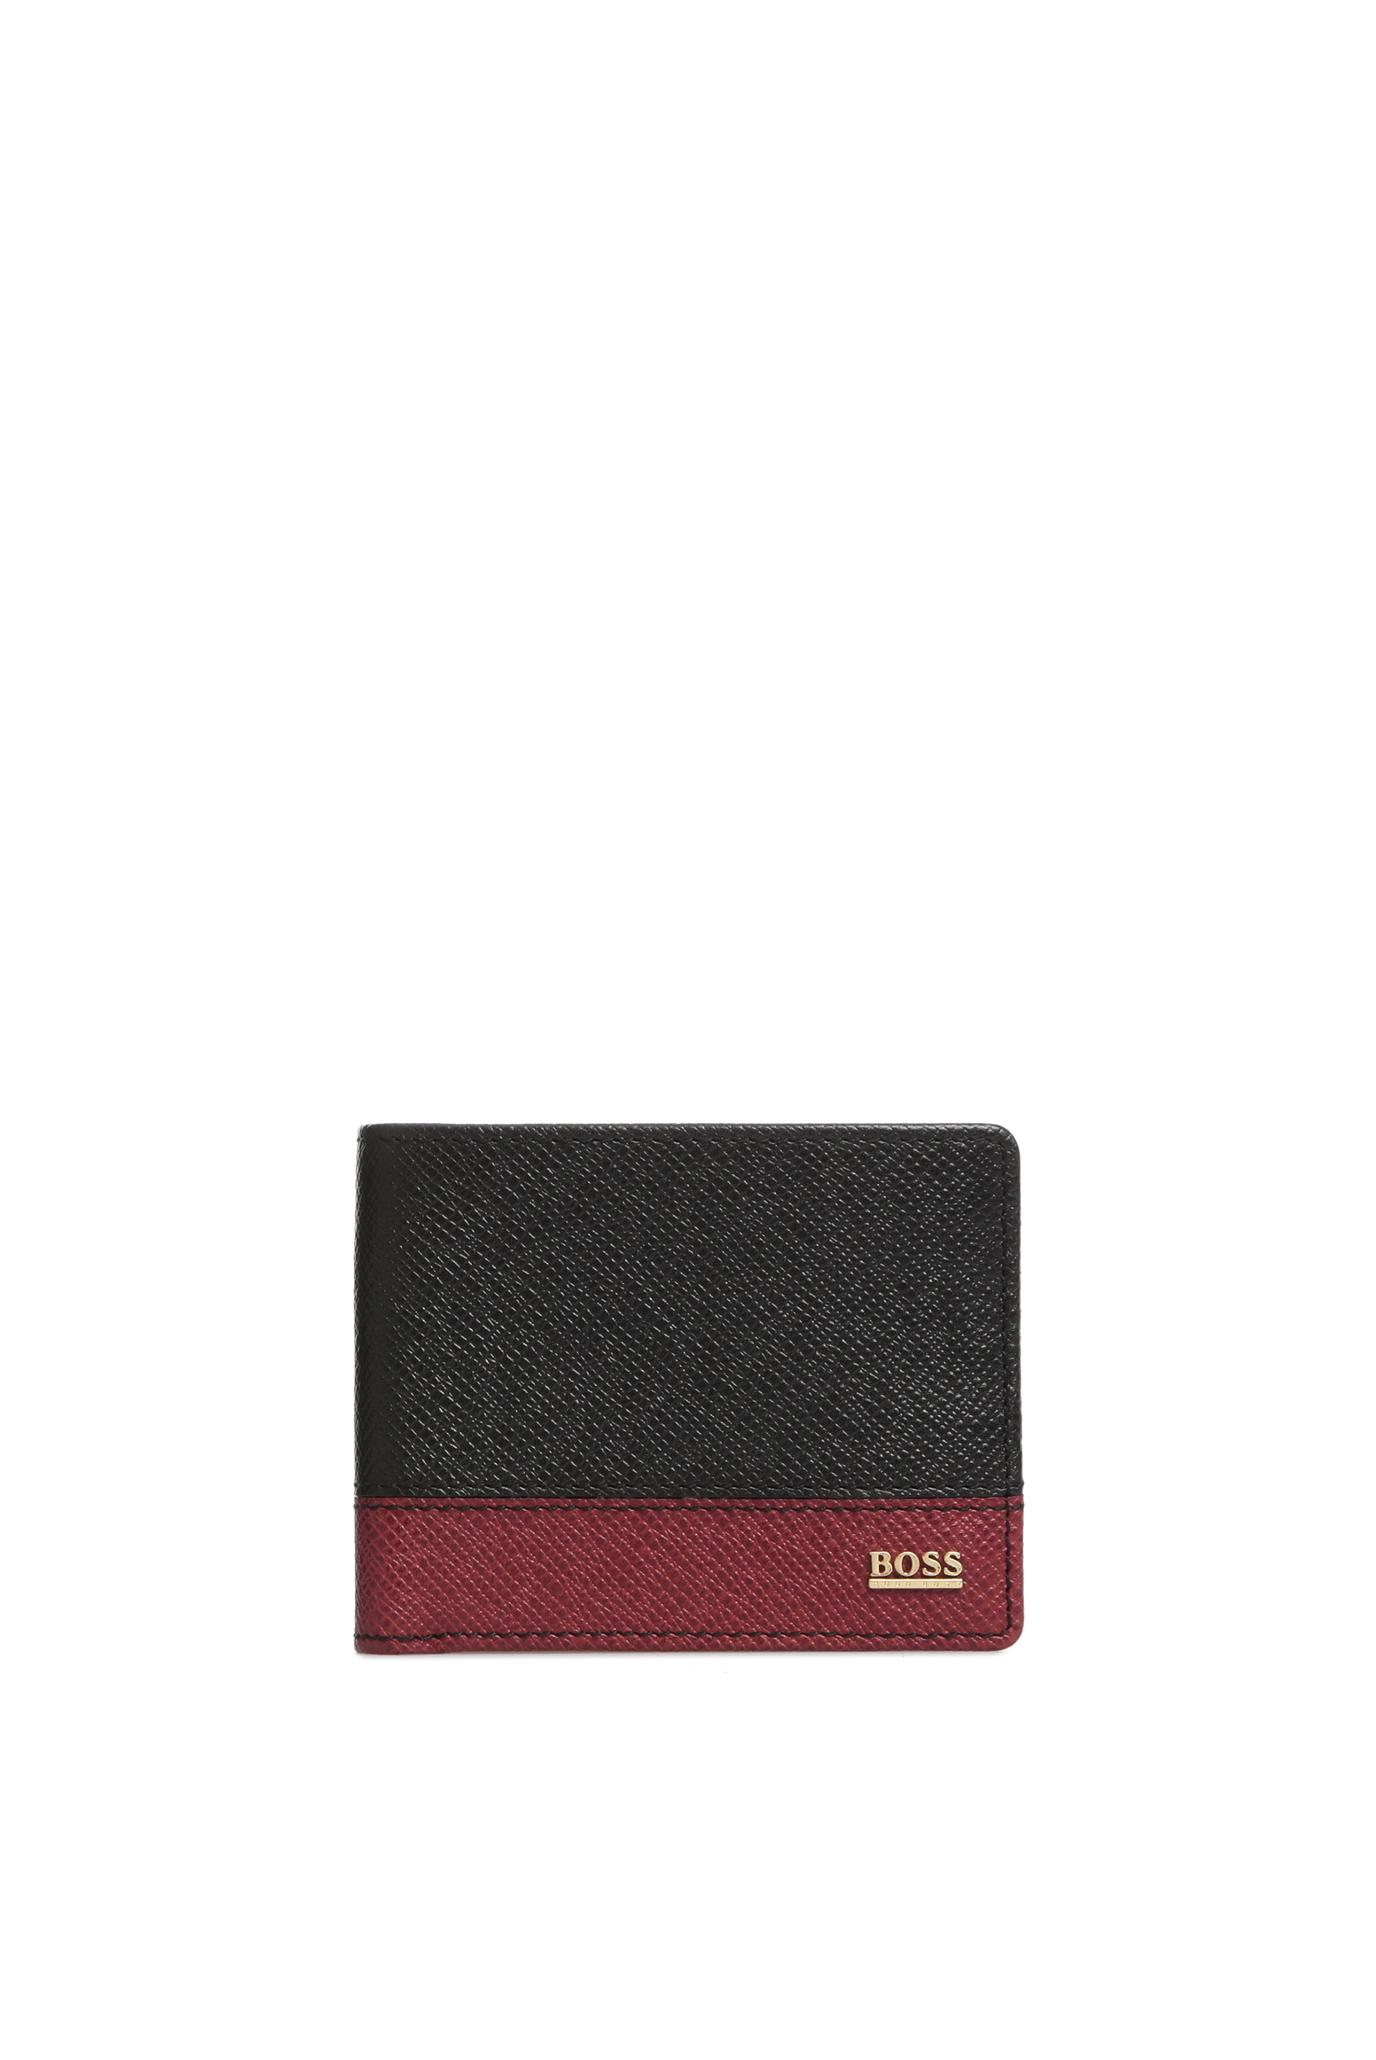 Мужской кожаный кошелек BOSS 50424041;001